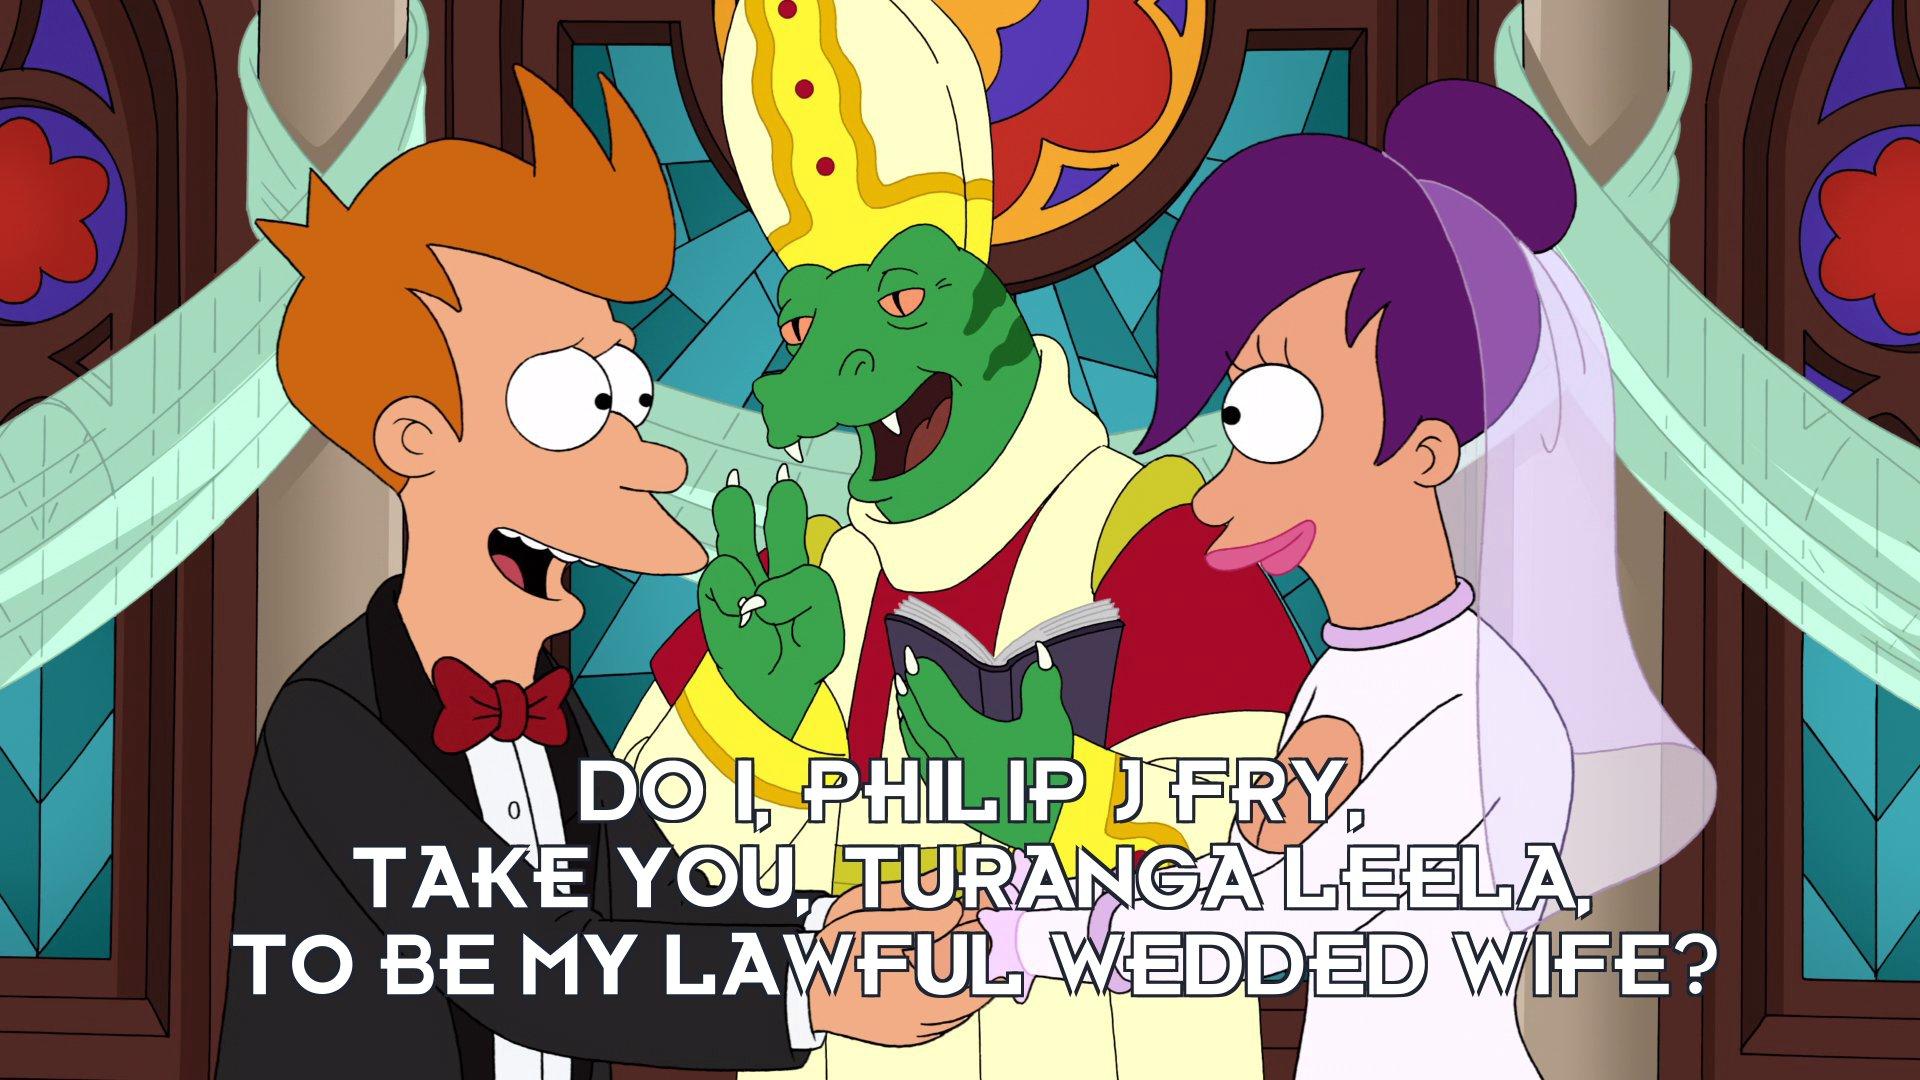 Philip J Fry: Do I, Philip J Fry, take you, Turanga Leela, to be my lawful wedded wife?